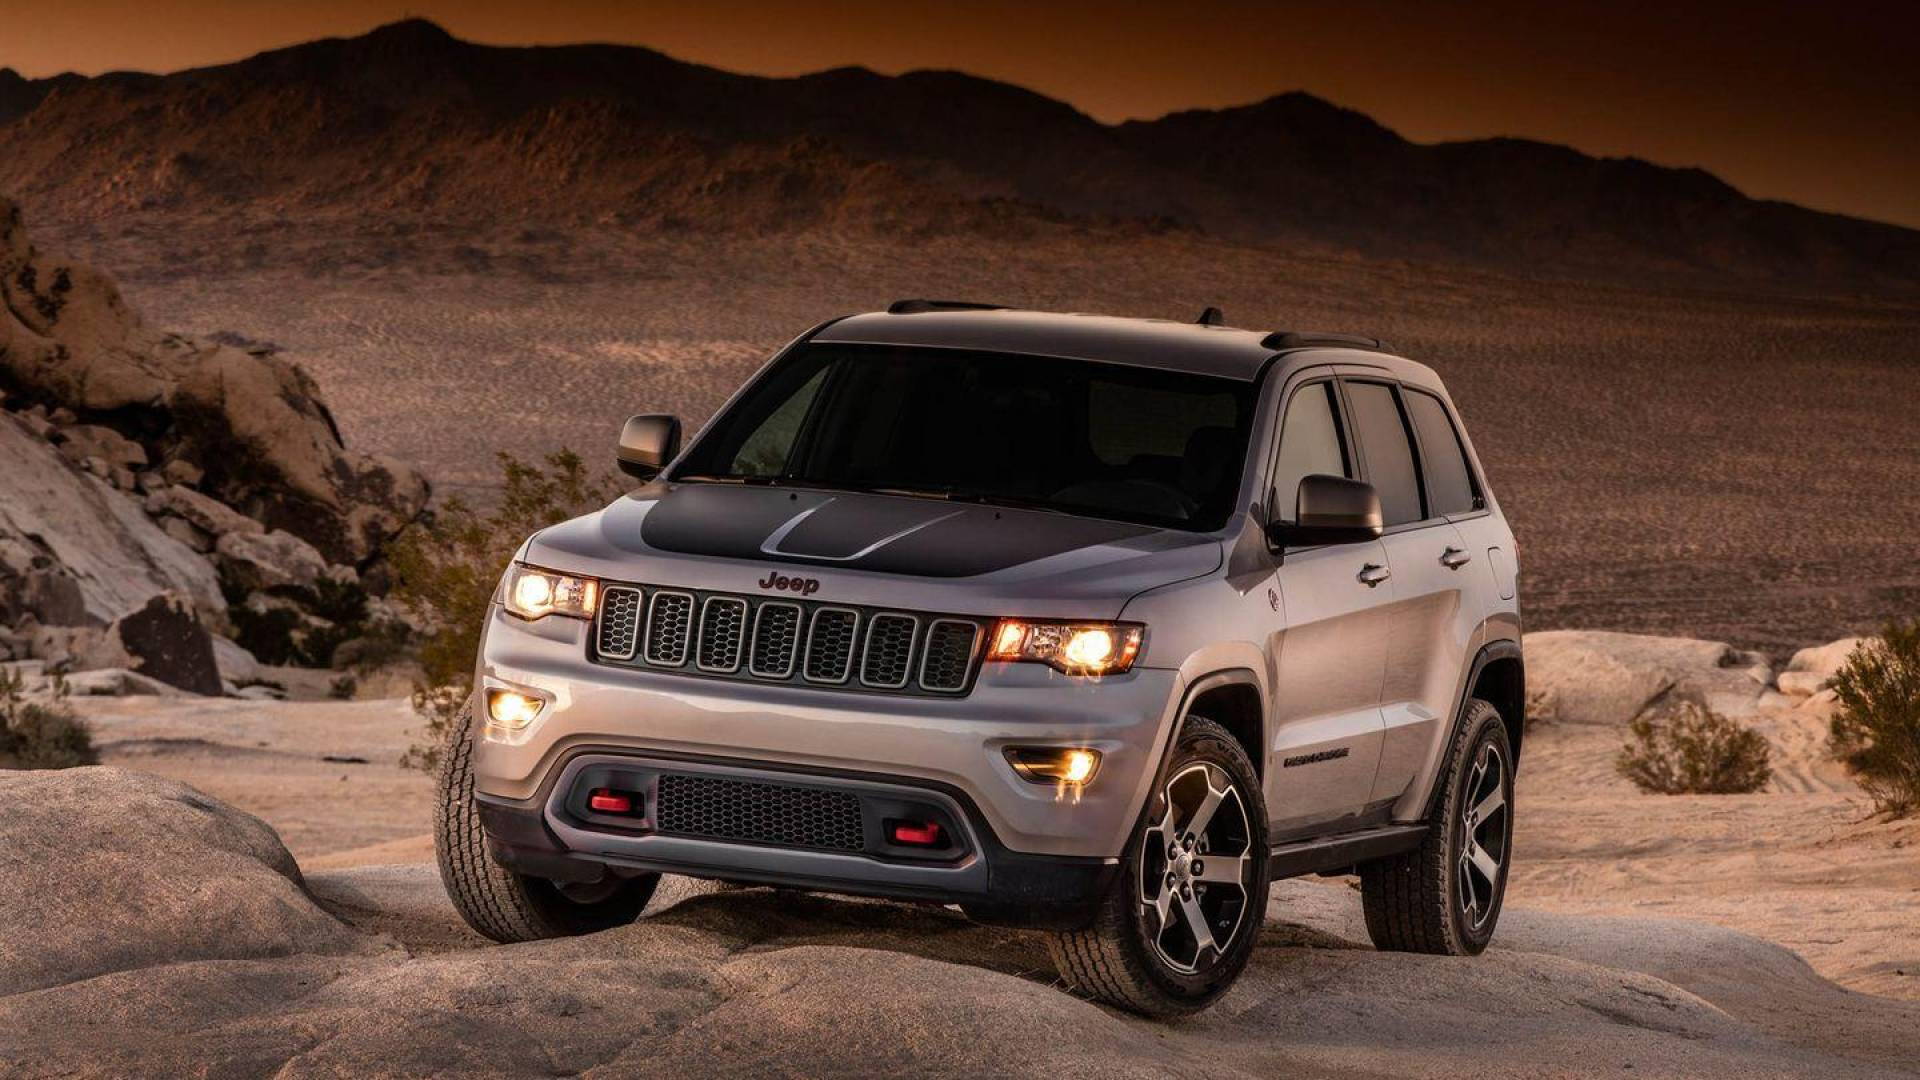 Где купить автомобиль Jeep Grand Cherokee?